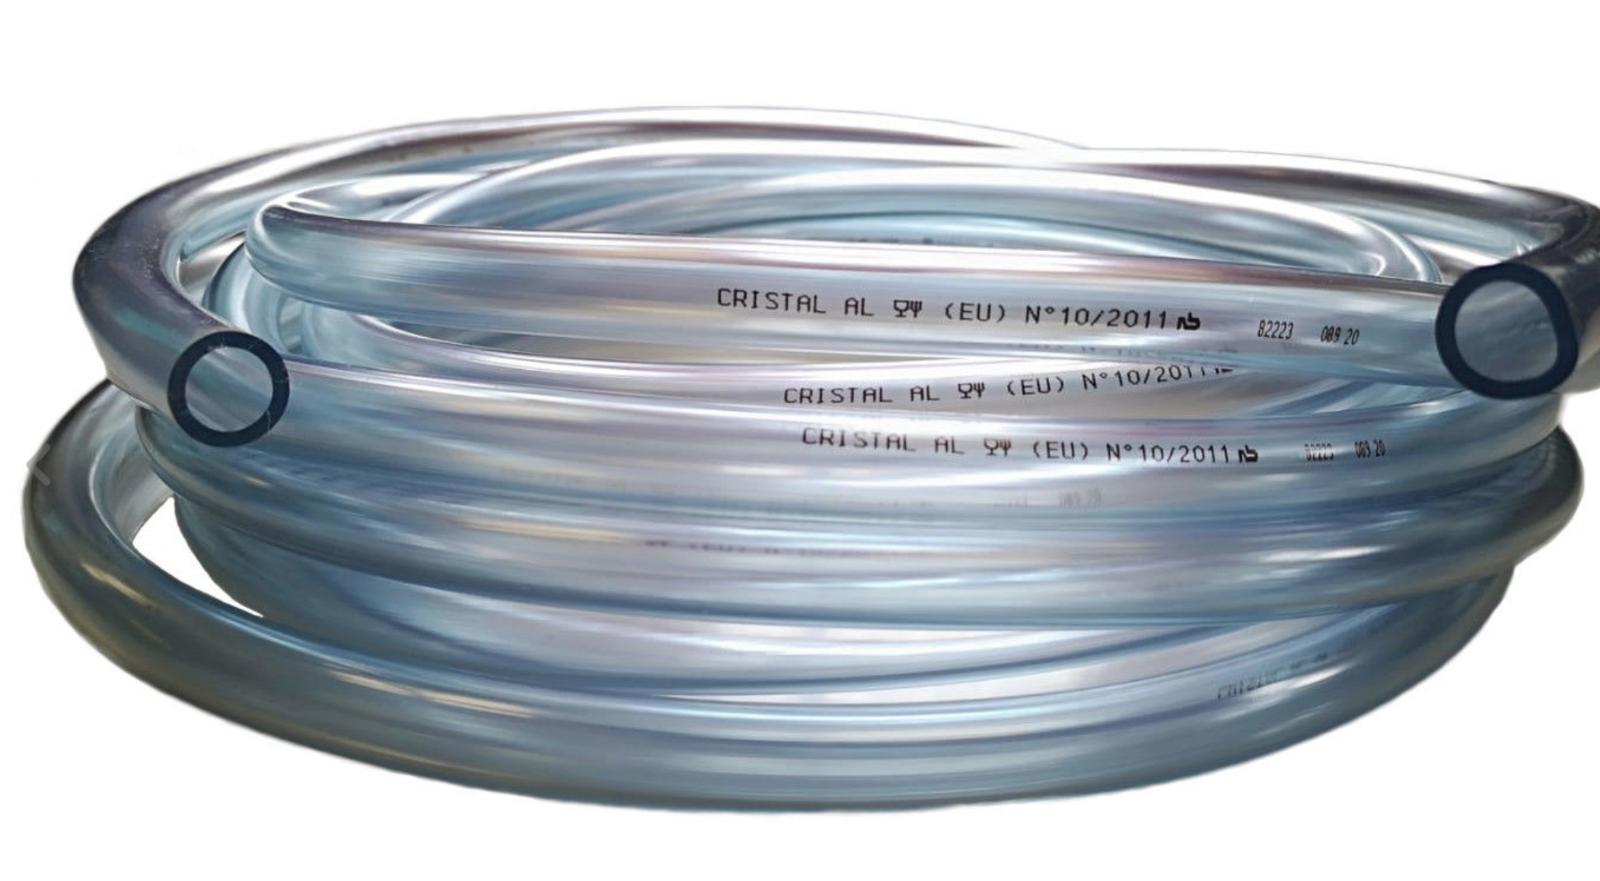 3-19mm PVC Tube Plastique Transparent Tuyau Food Grade Bassin Poisson Voiture